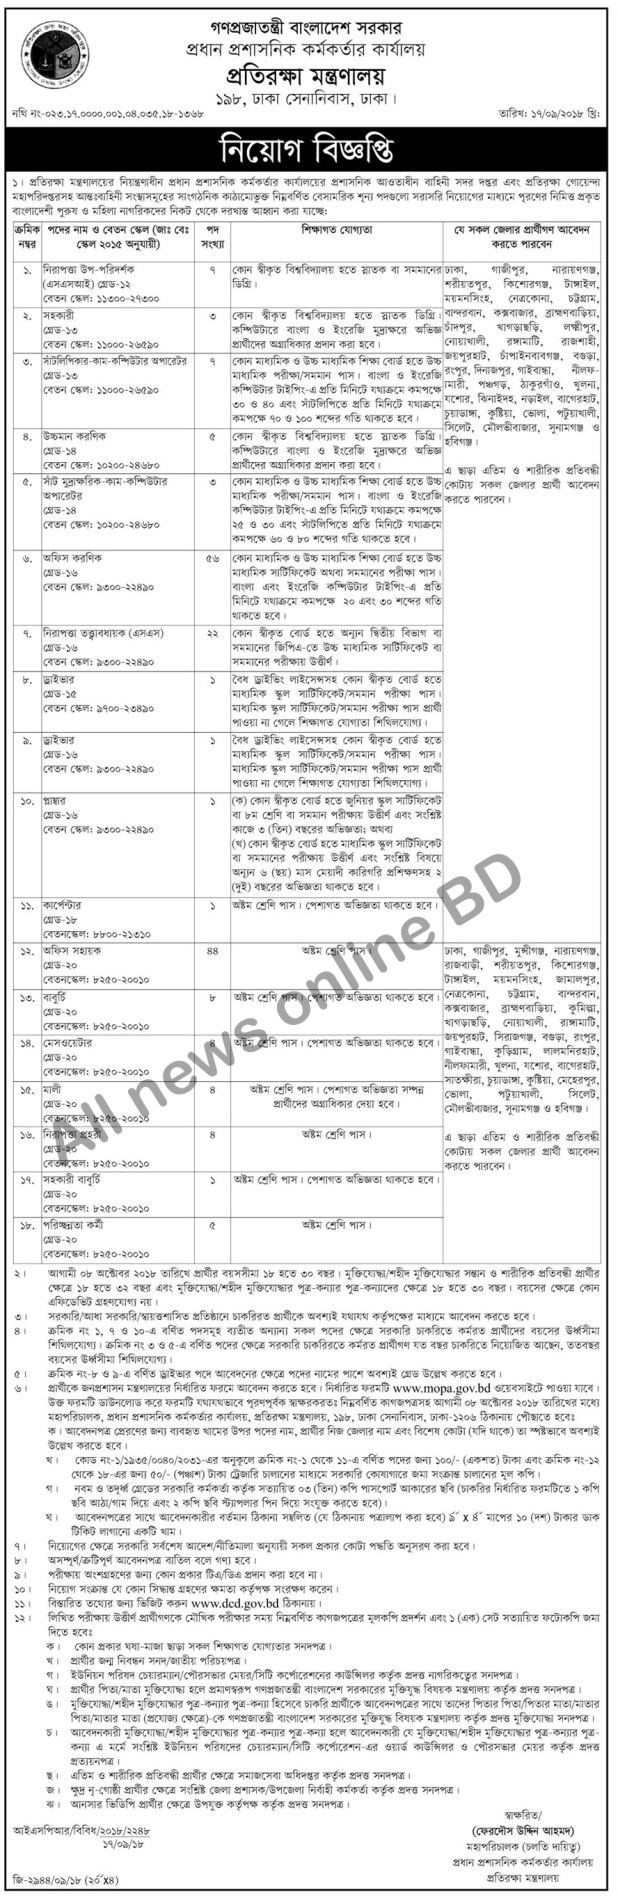 Ministry Of Defence Job Circular 2018